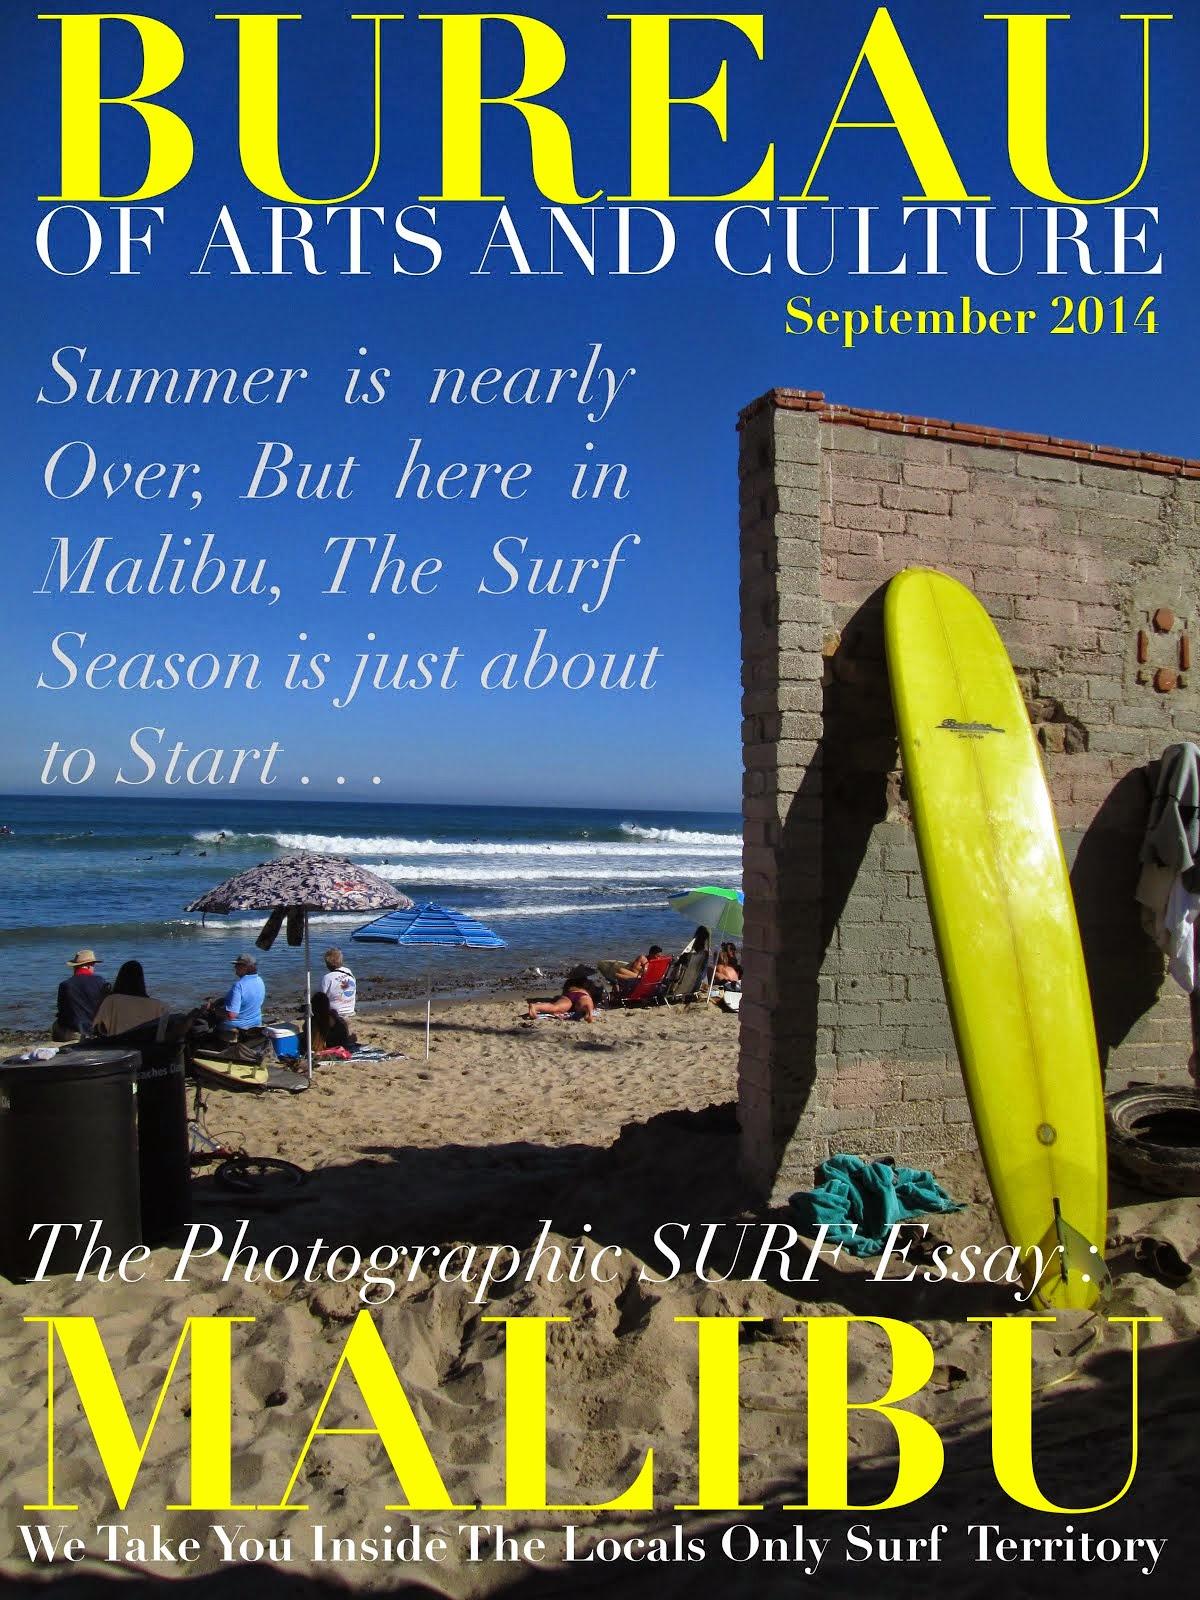 READ BUREAU SURFING SECTION